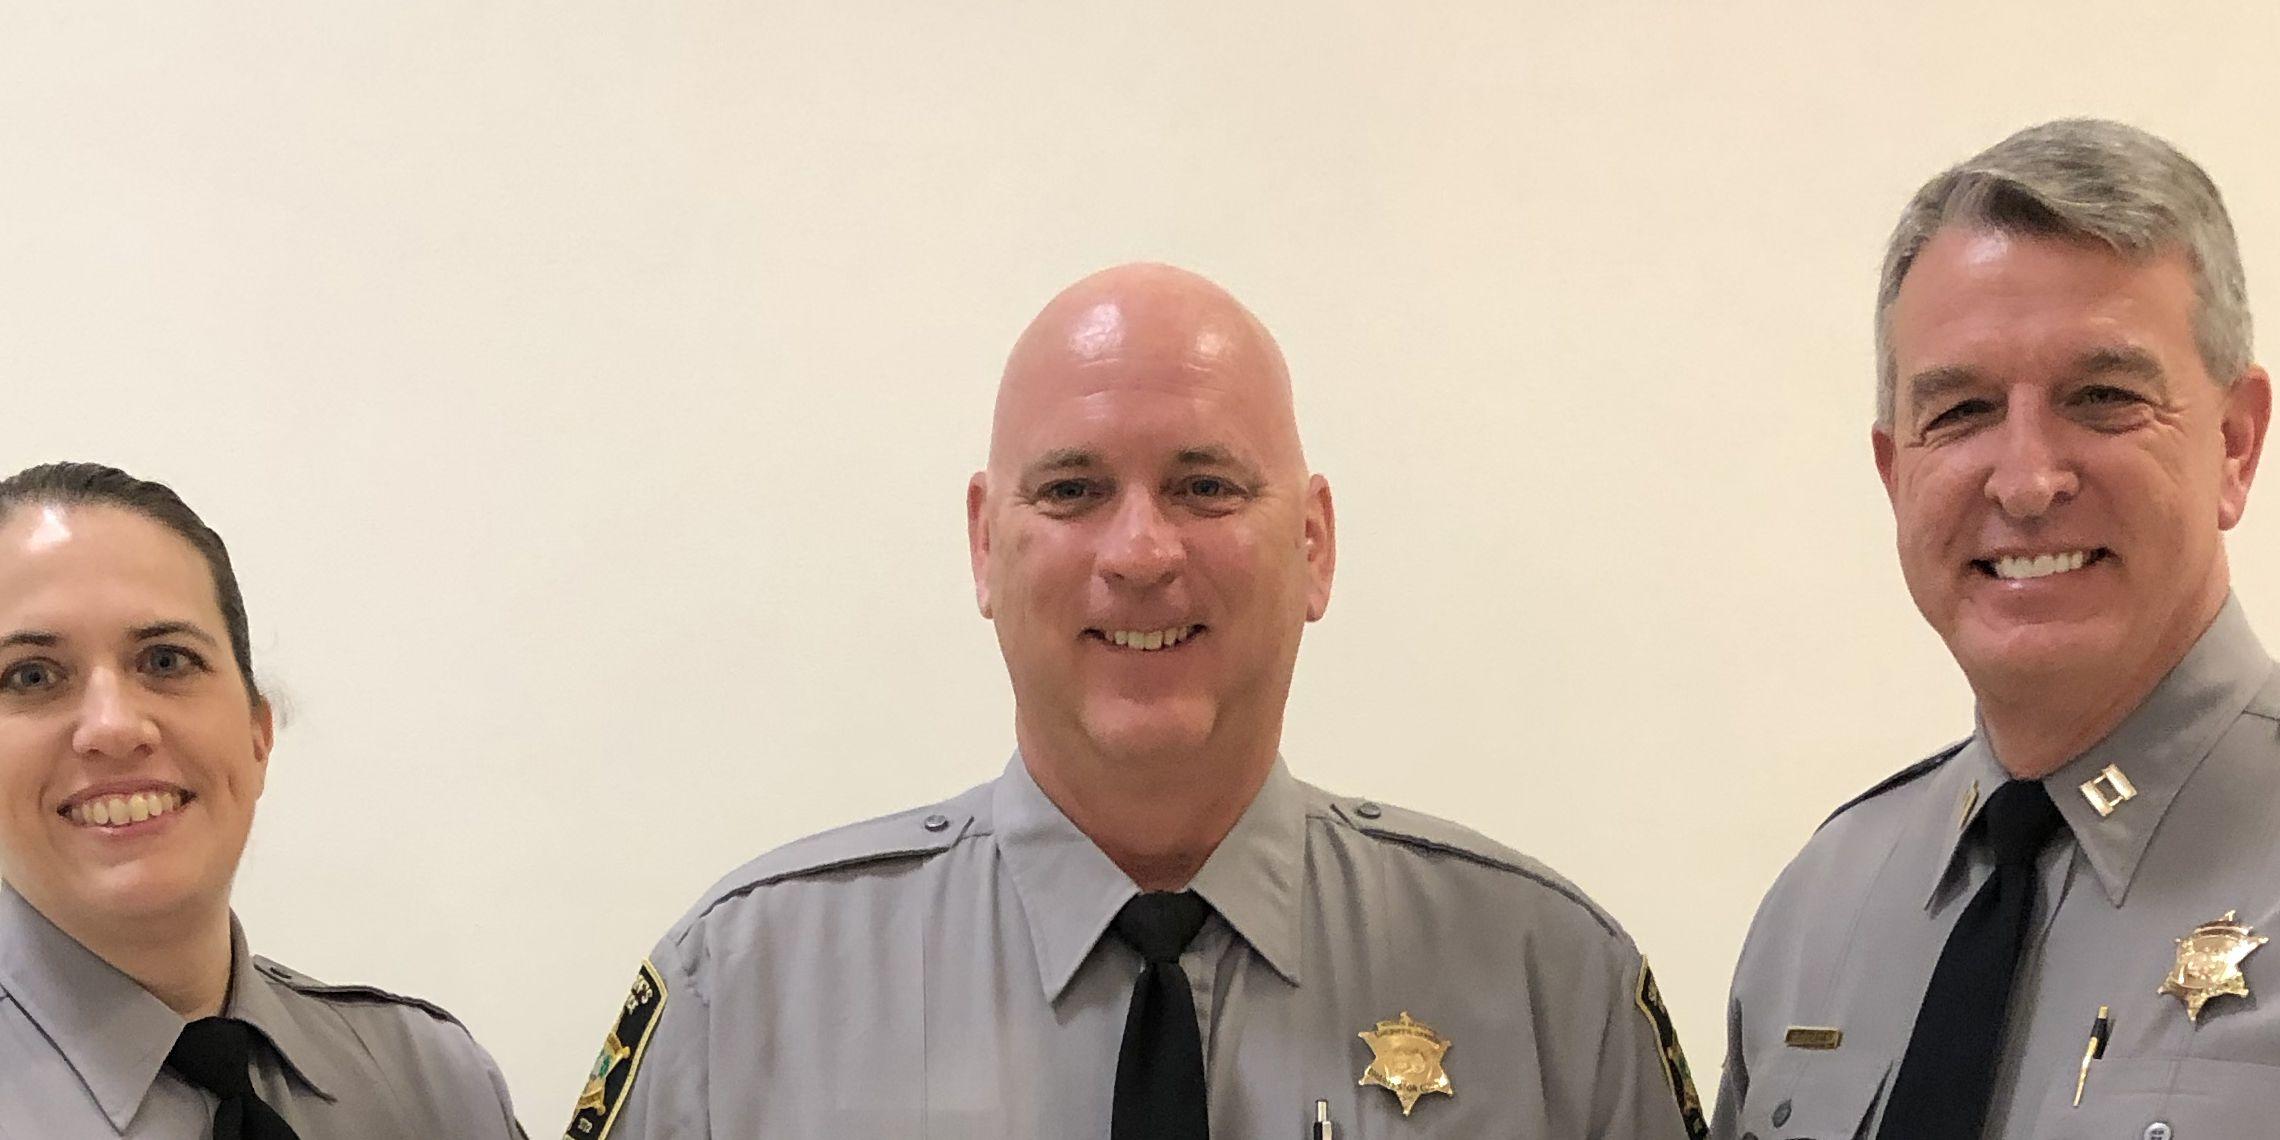 Charleston Co. Deputy wins Deputy of the Year